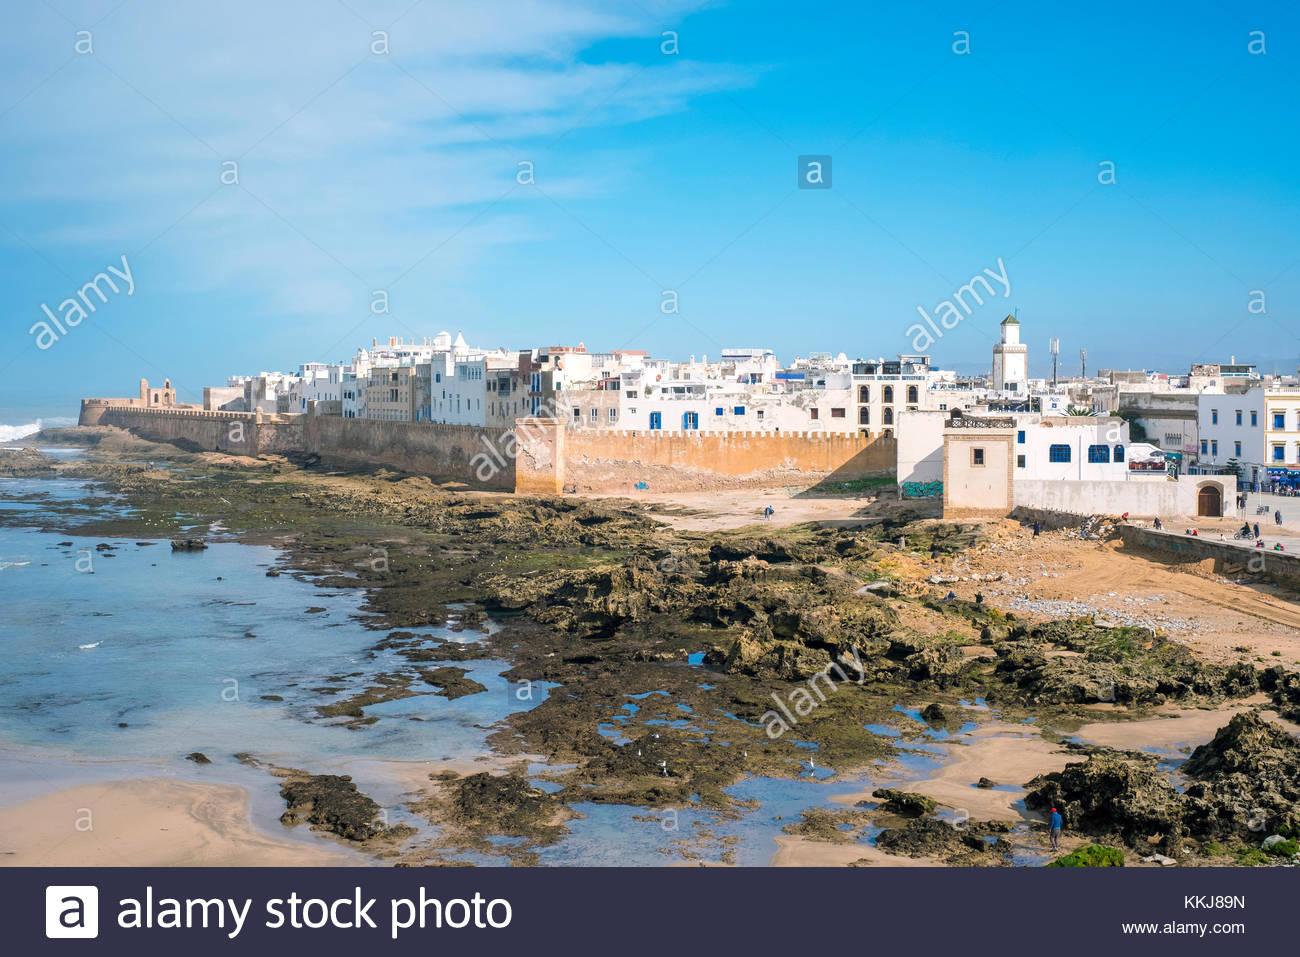 Marokko, Marrakesch (Marrakesch - Safi - tensift-El Haouz) Region, Essaouira. Medina, Altstadt, des 18. Jahrhunderts Stockbild